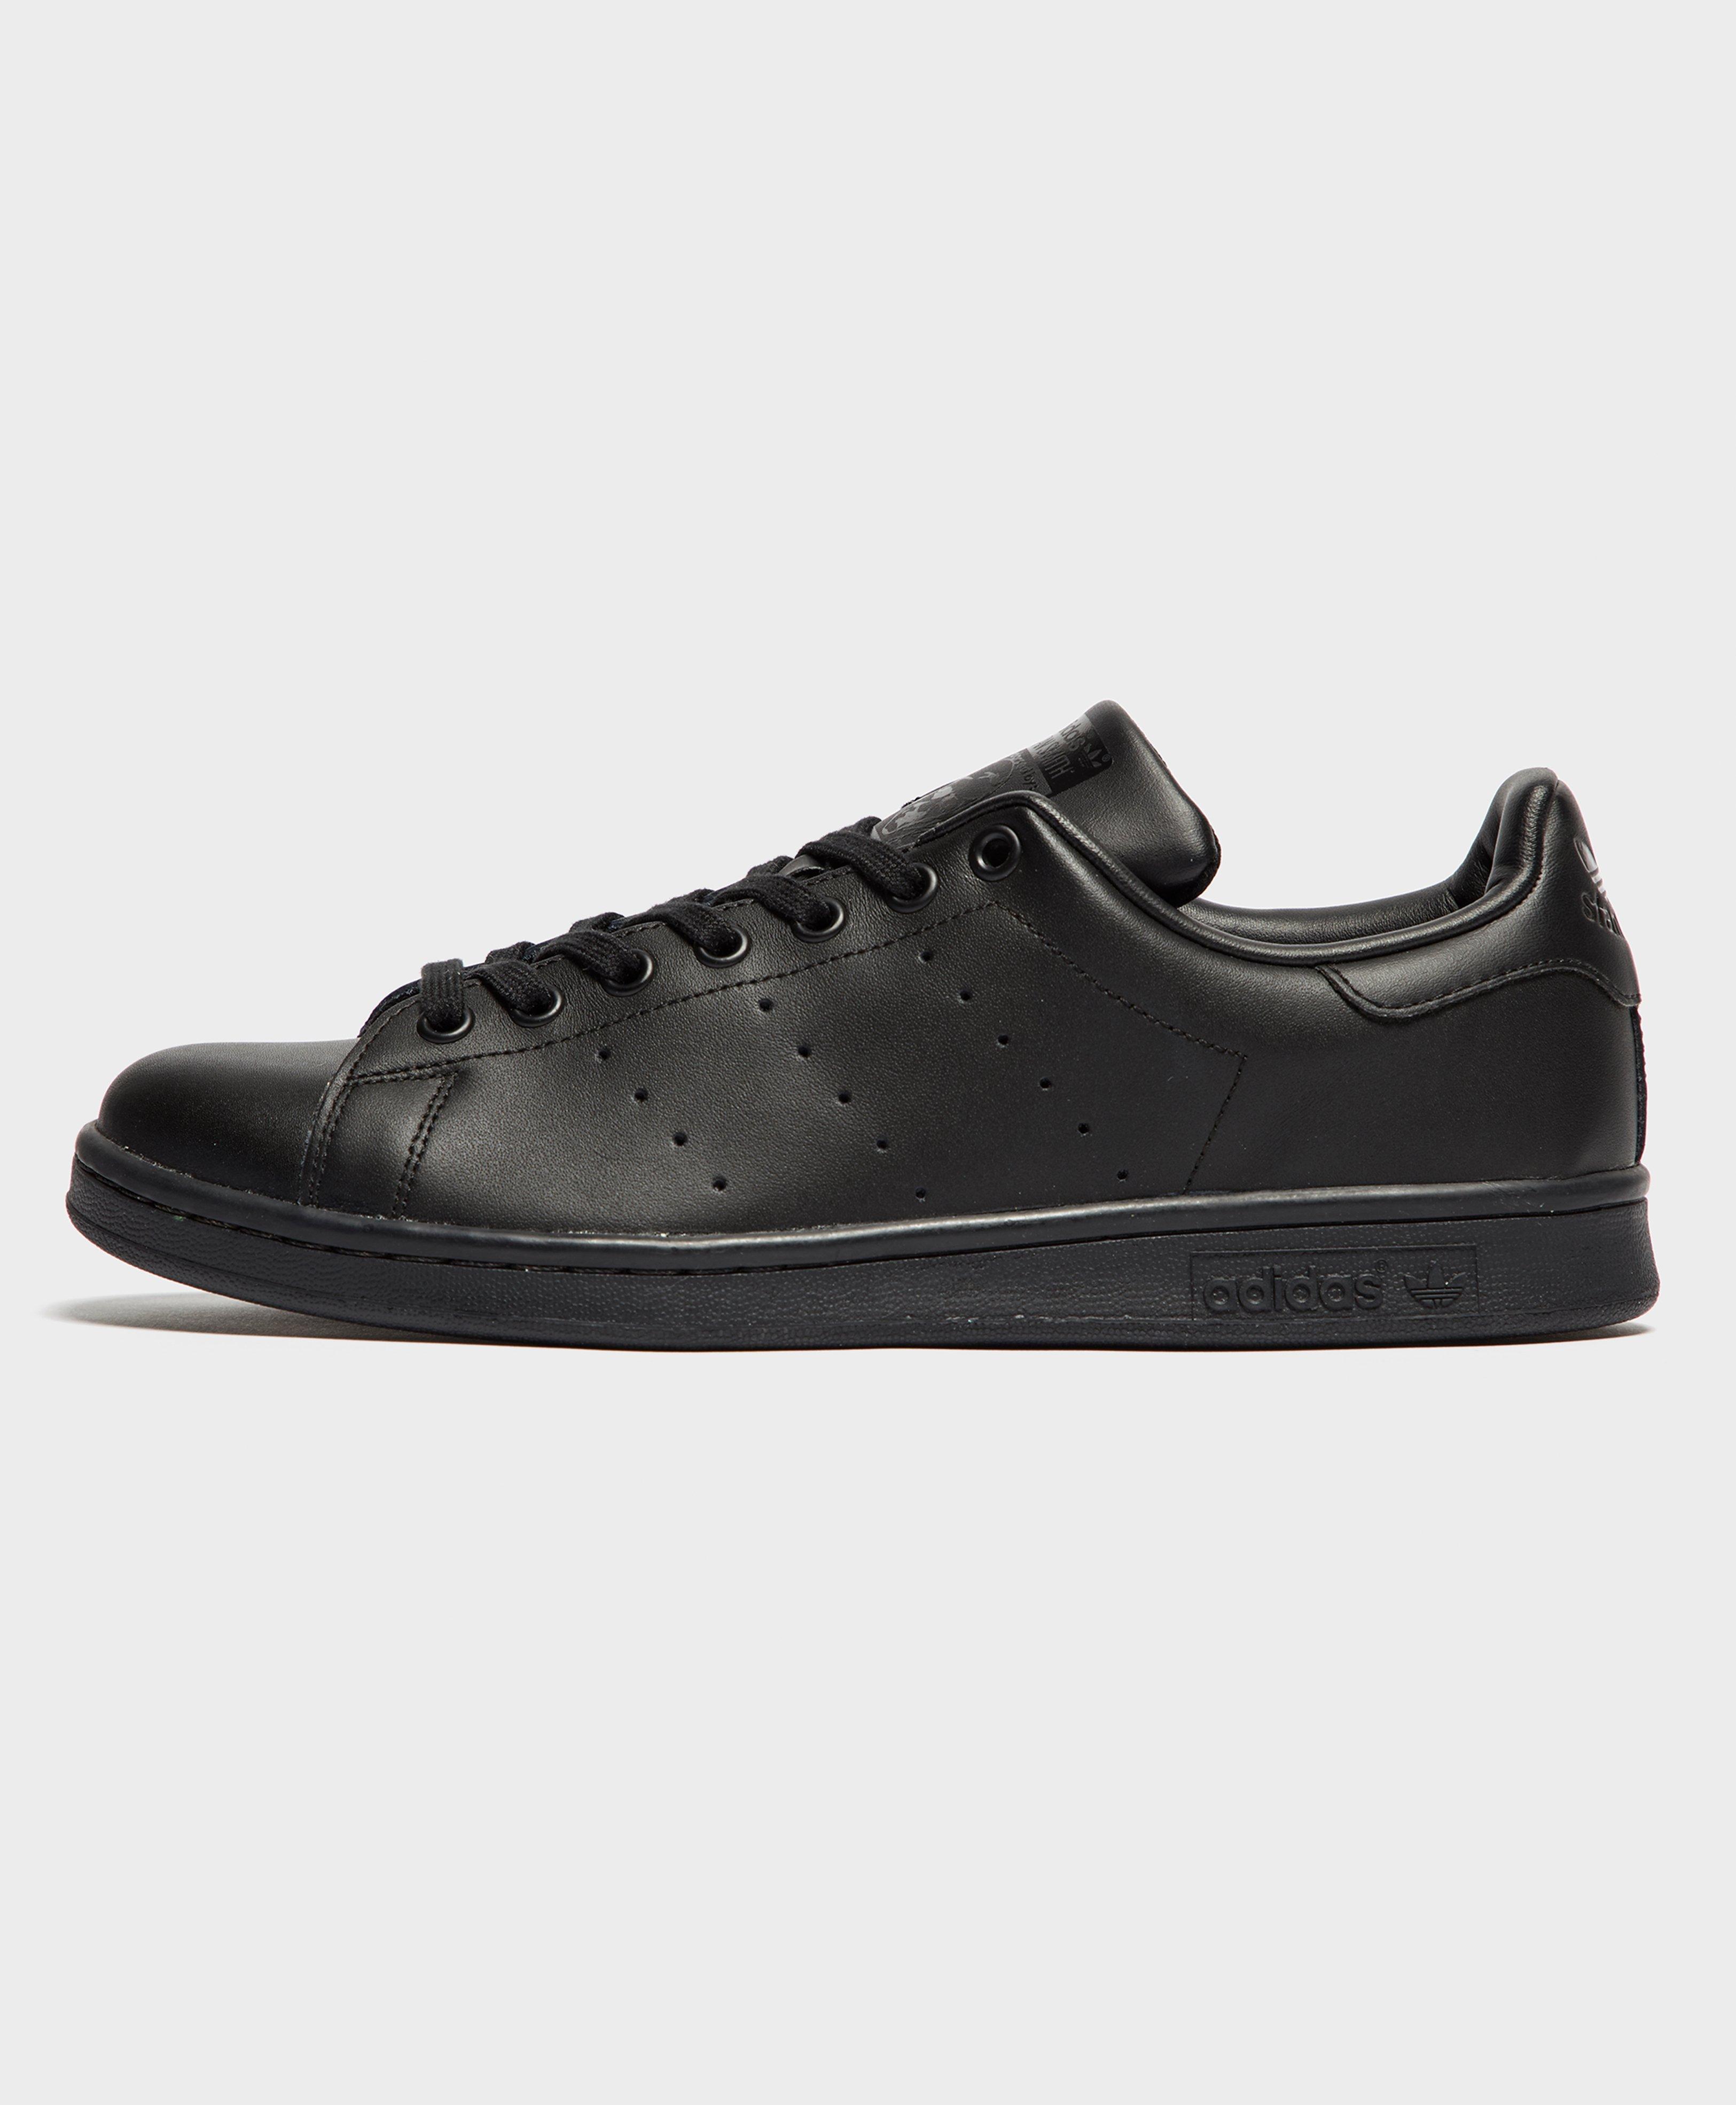 adidas Originals Stan Smith in Black for Men - Lyst b876aaabb